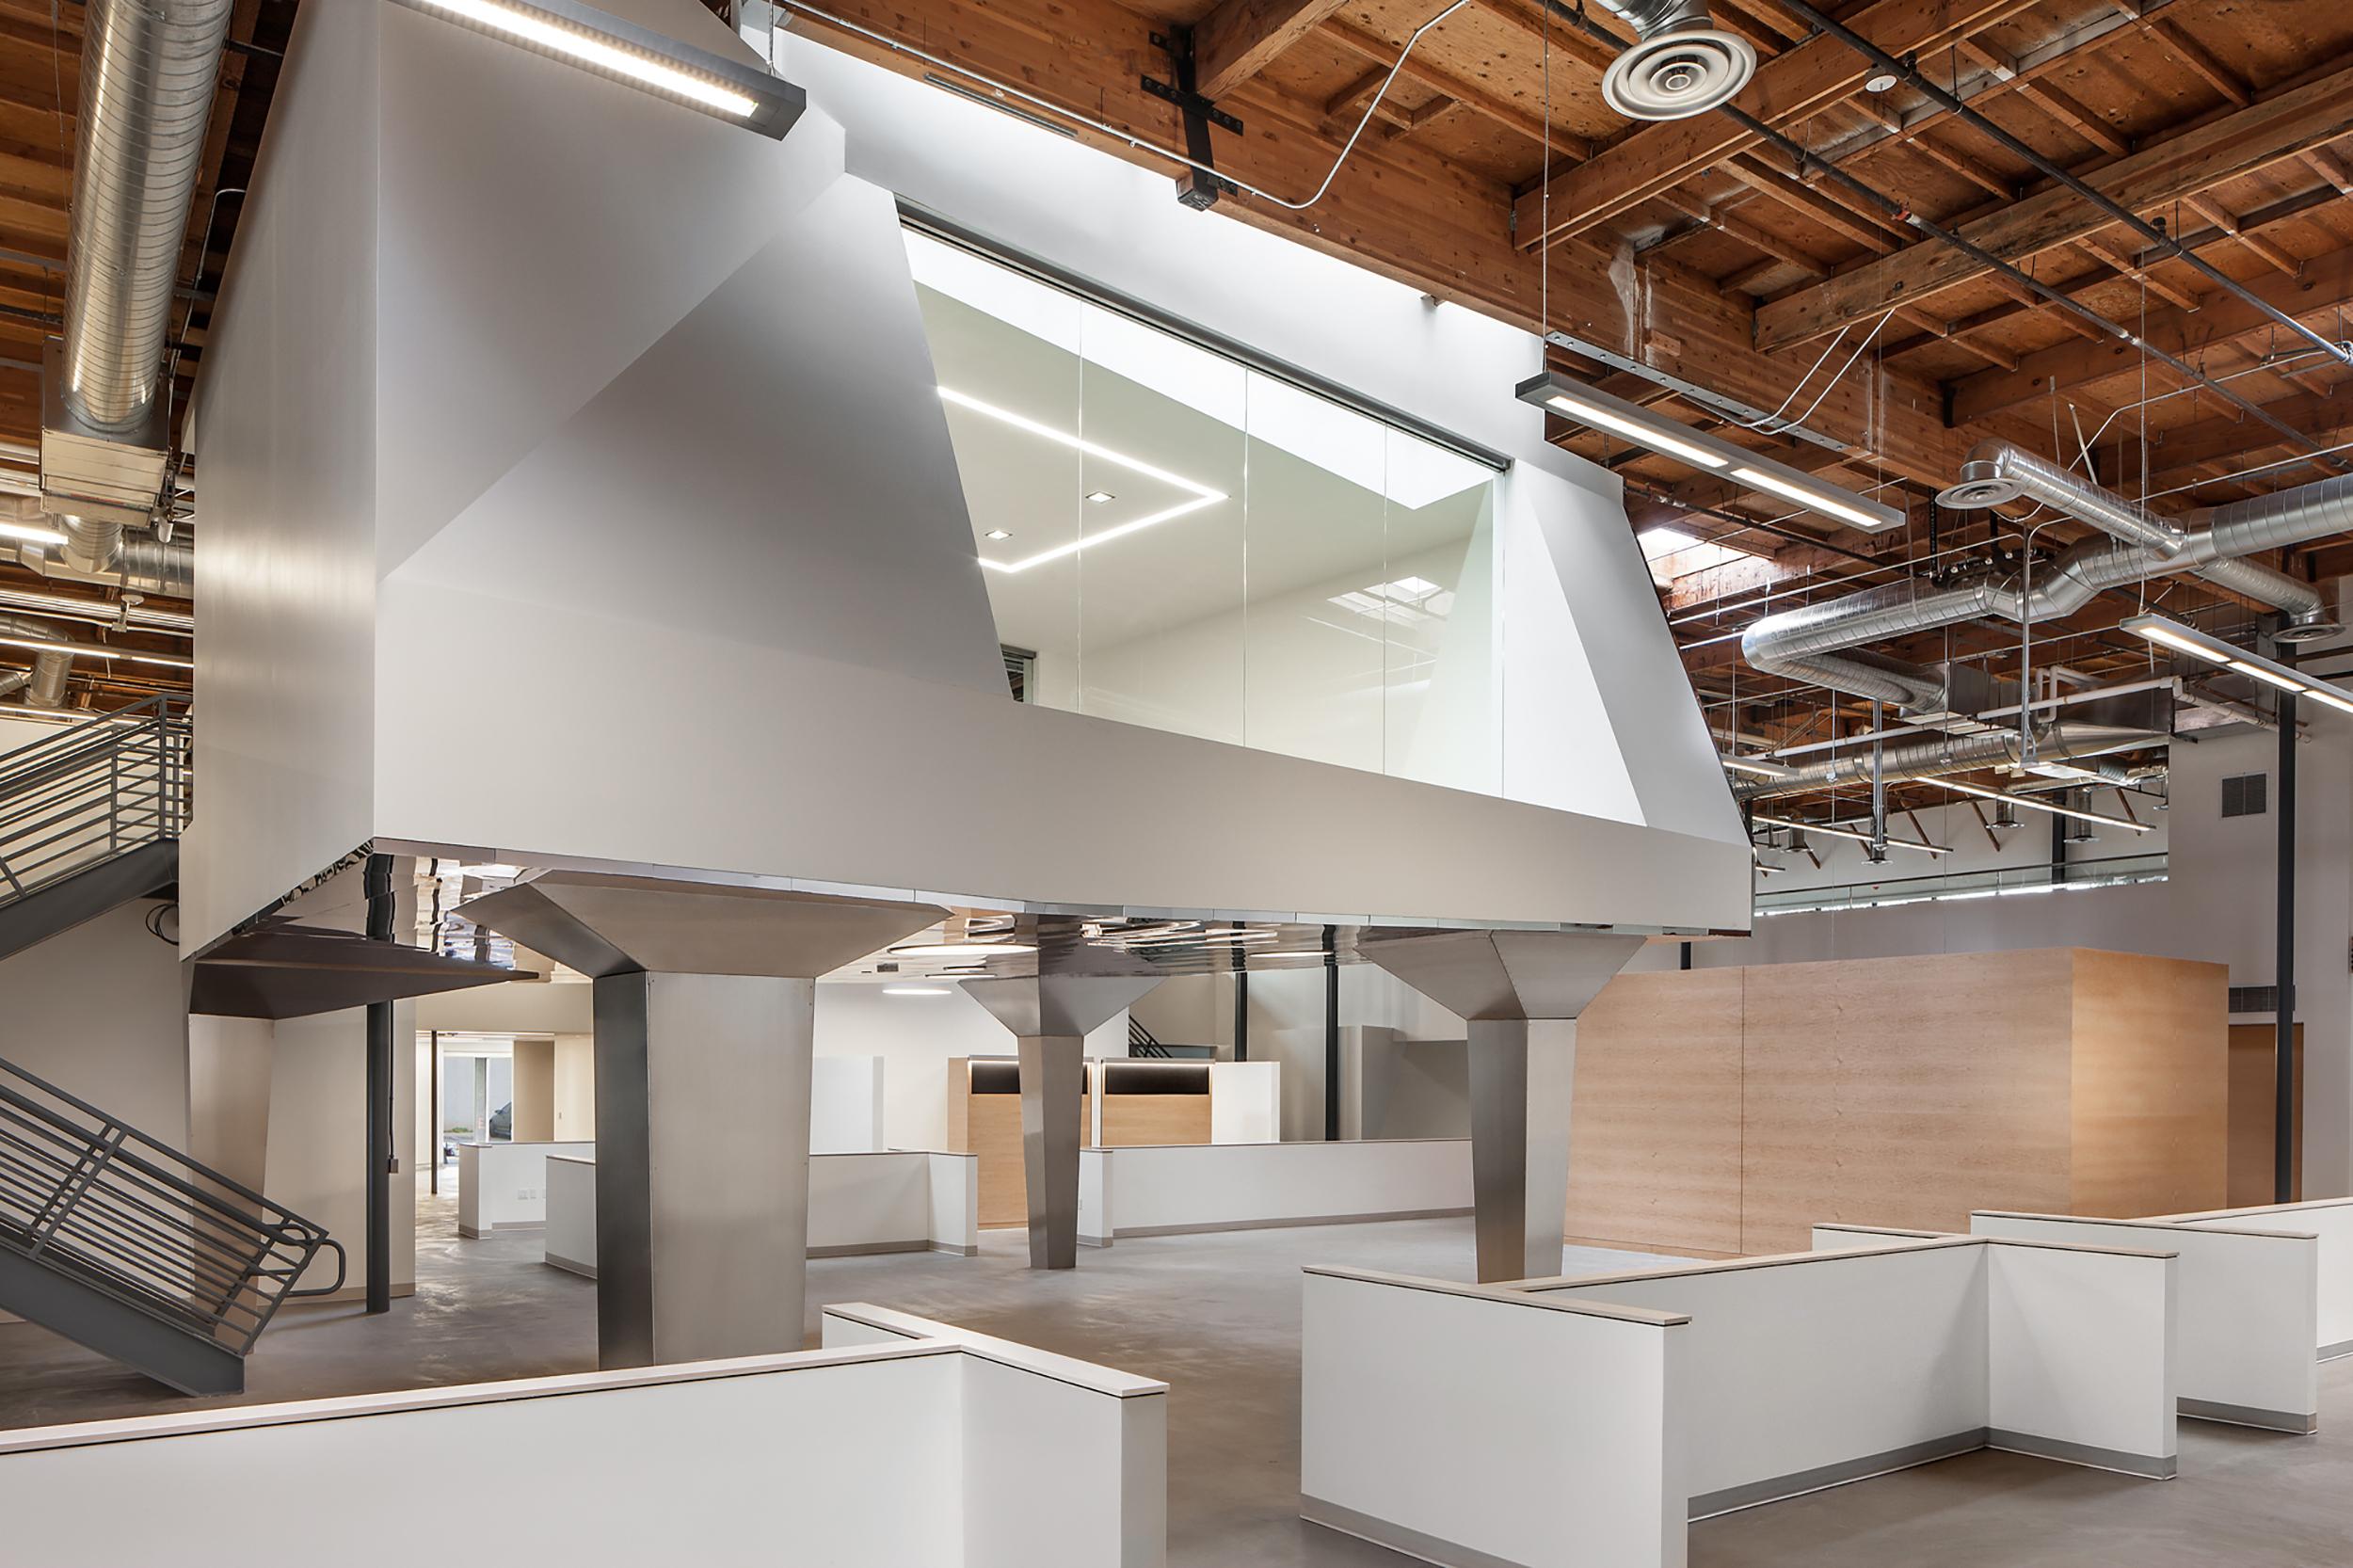 STUDIO 4509 | Los Angeles, California